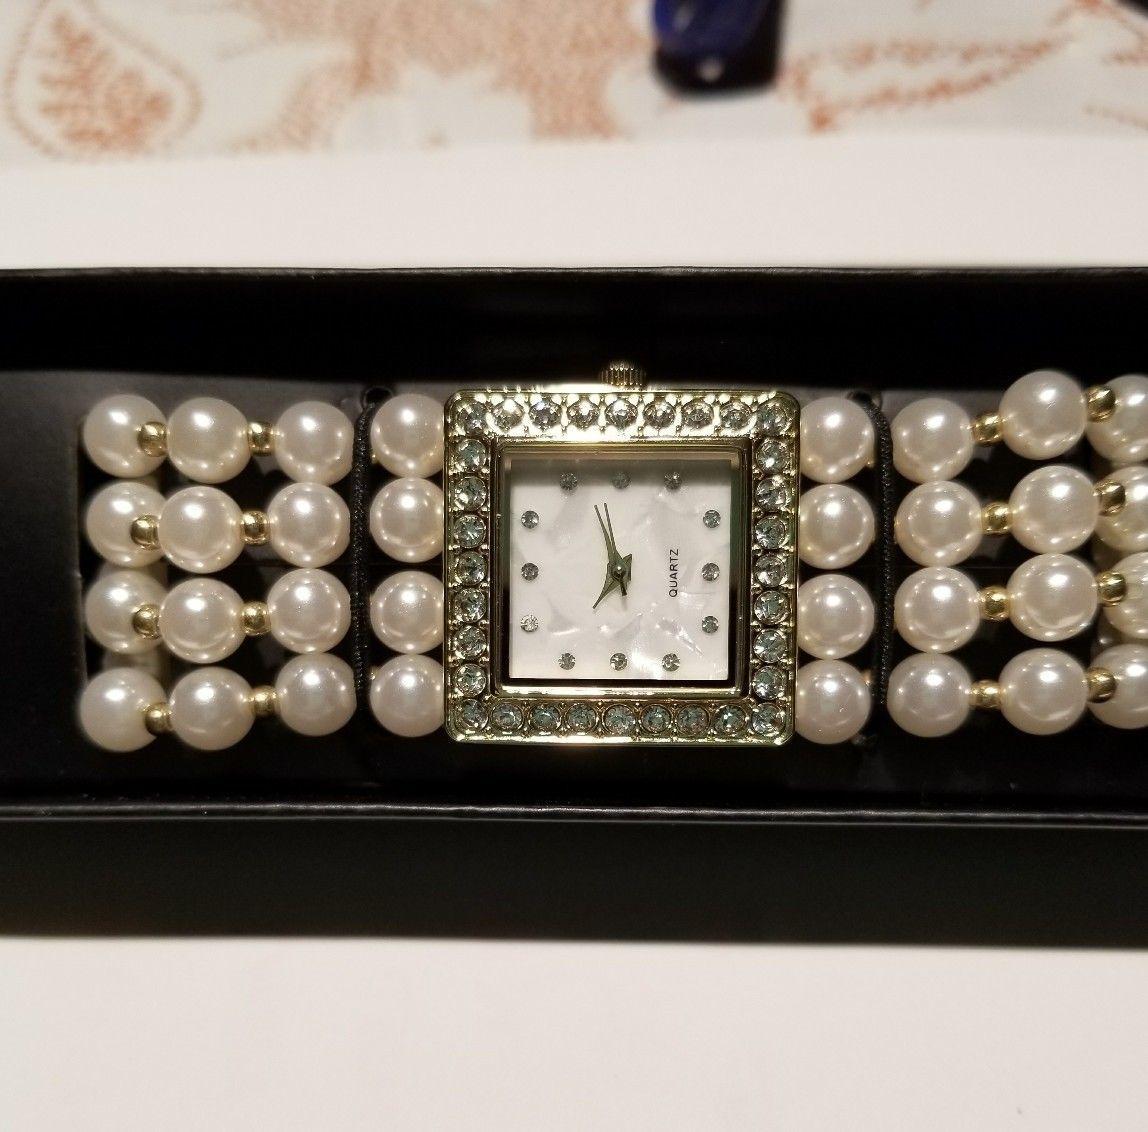 Modern Pearlesque Stretch Bracelet Watch